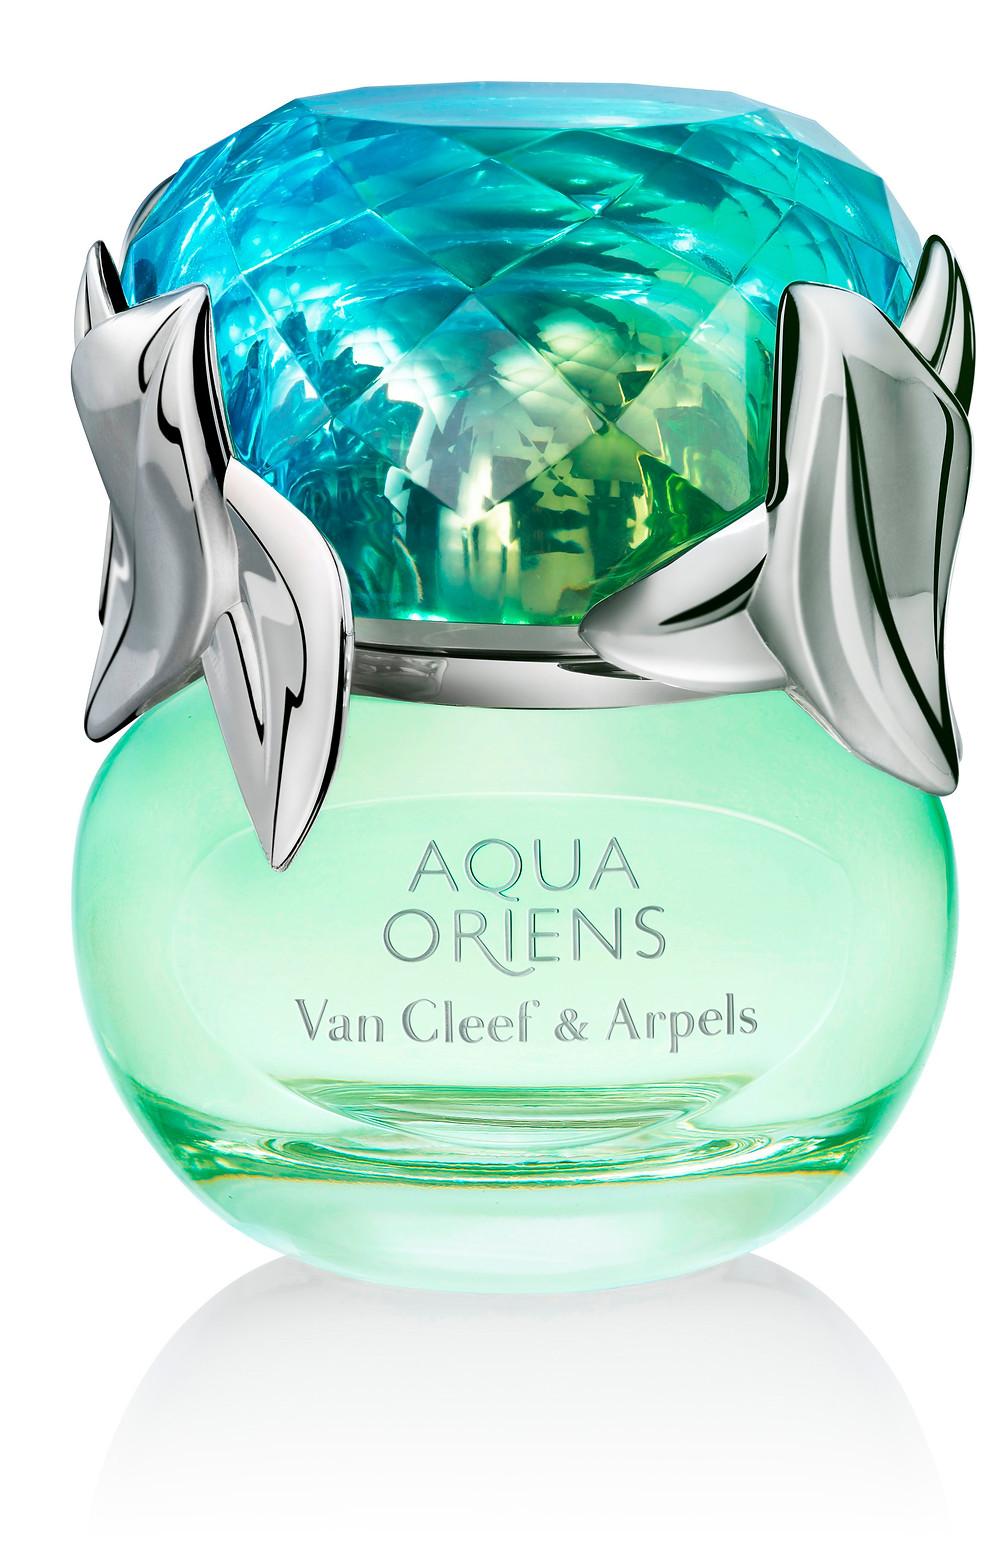 padr09.03b-parfumdreams.de-van-cleef-arpels---aqua-oriens-highres.jpg